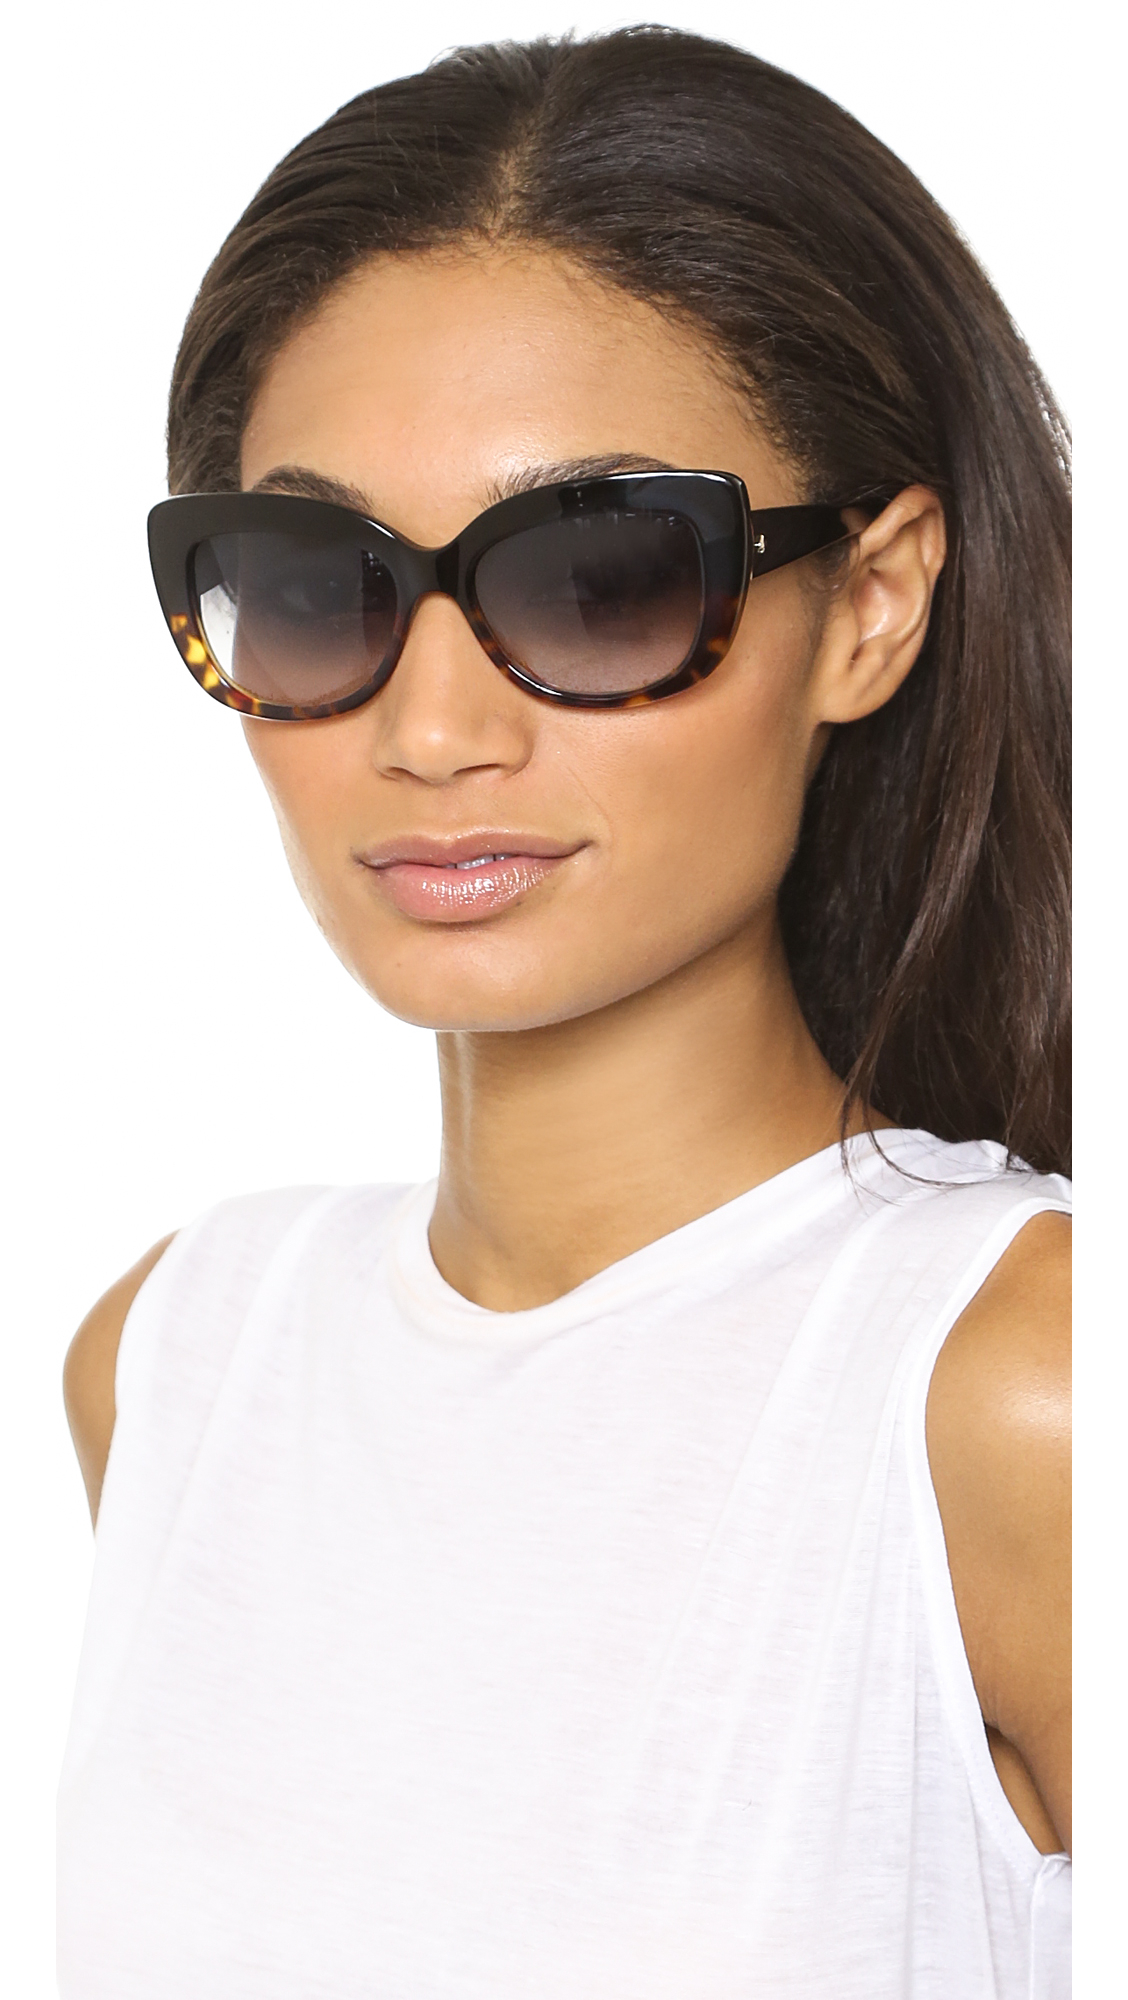 ab786382c18 Lyst - Kate Spade Ursula Sunglasses - Black Tortoise Fade Grey